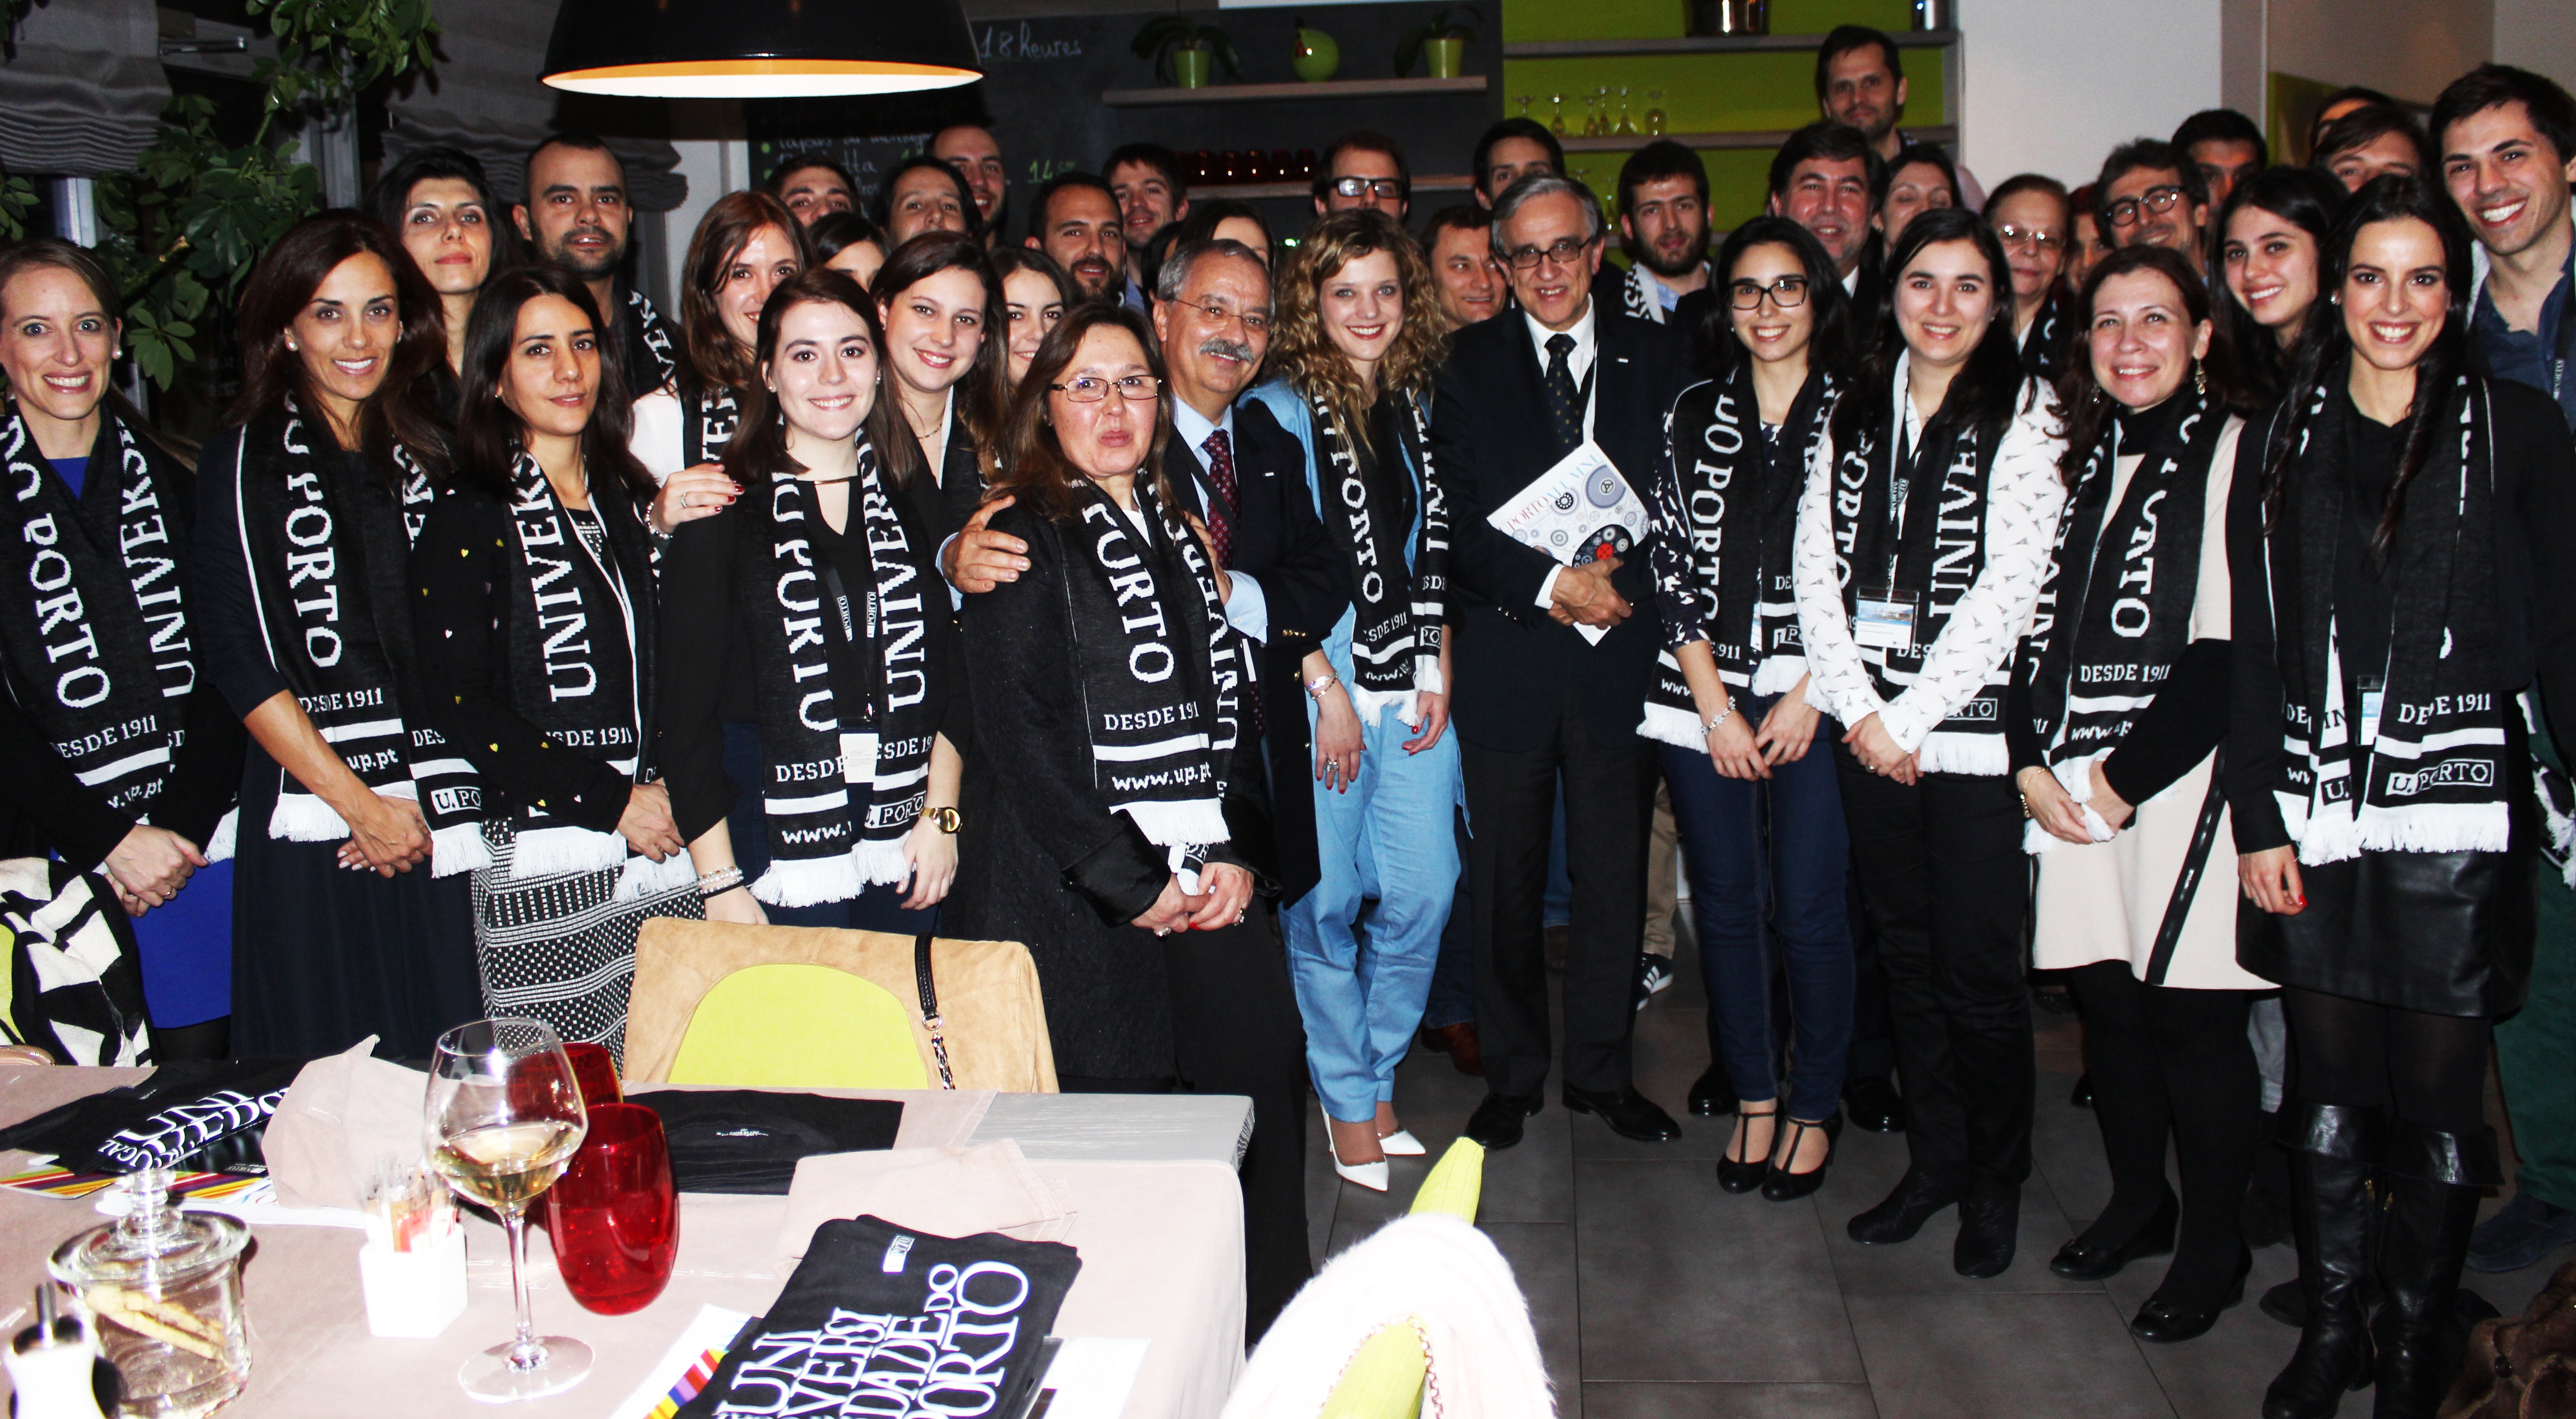 primeiro encontro alumni uporto suiça universidade do porto